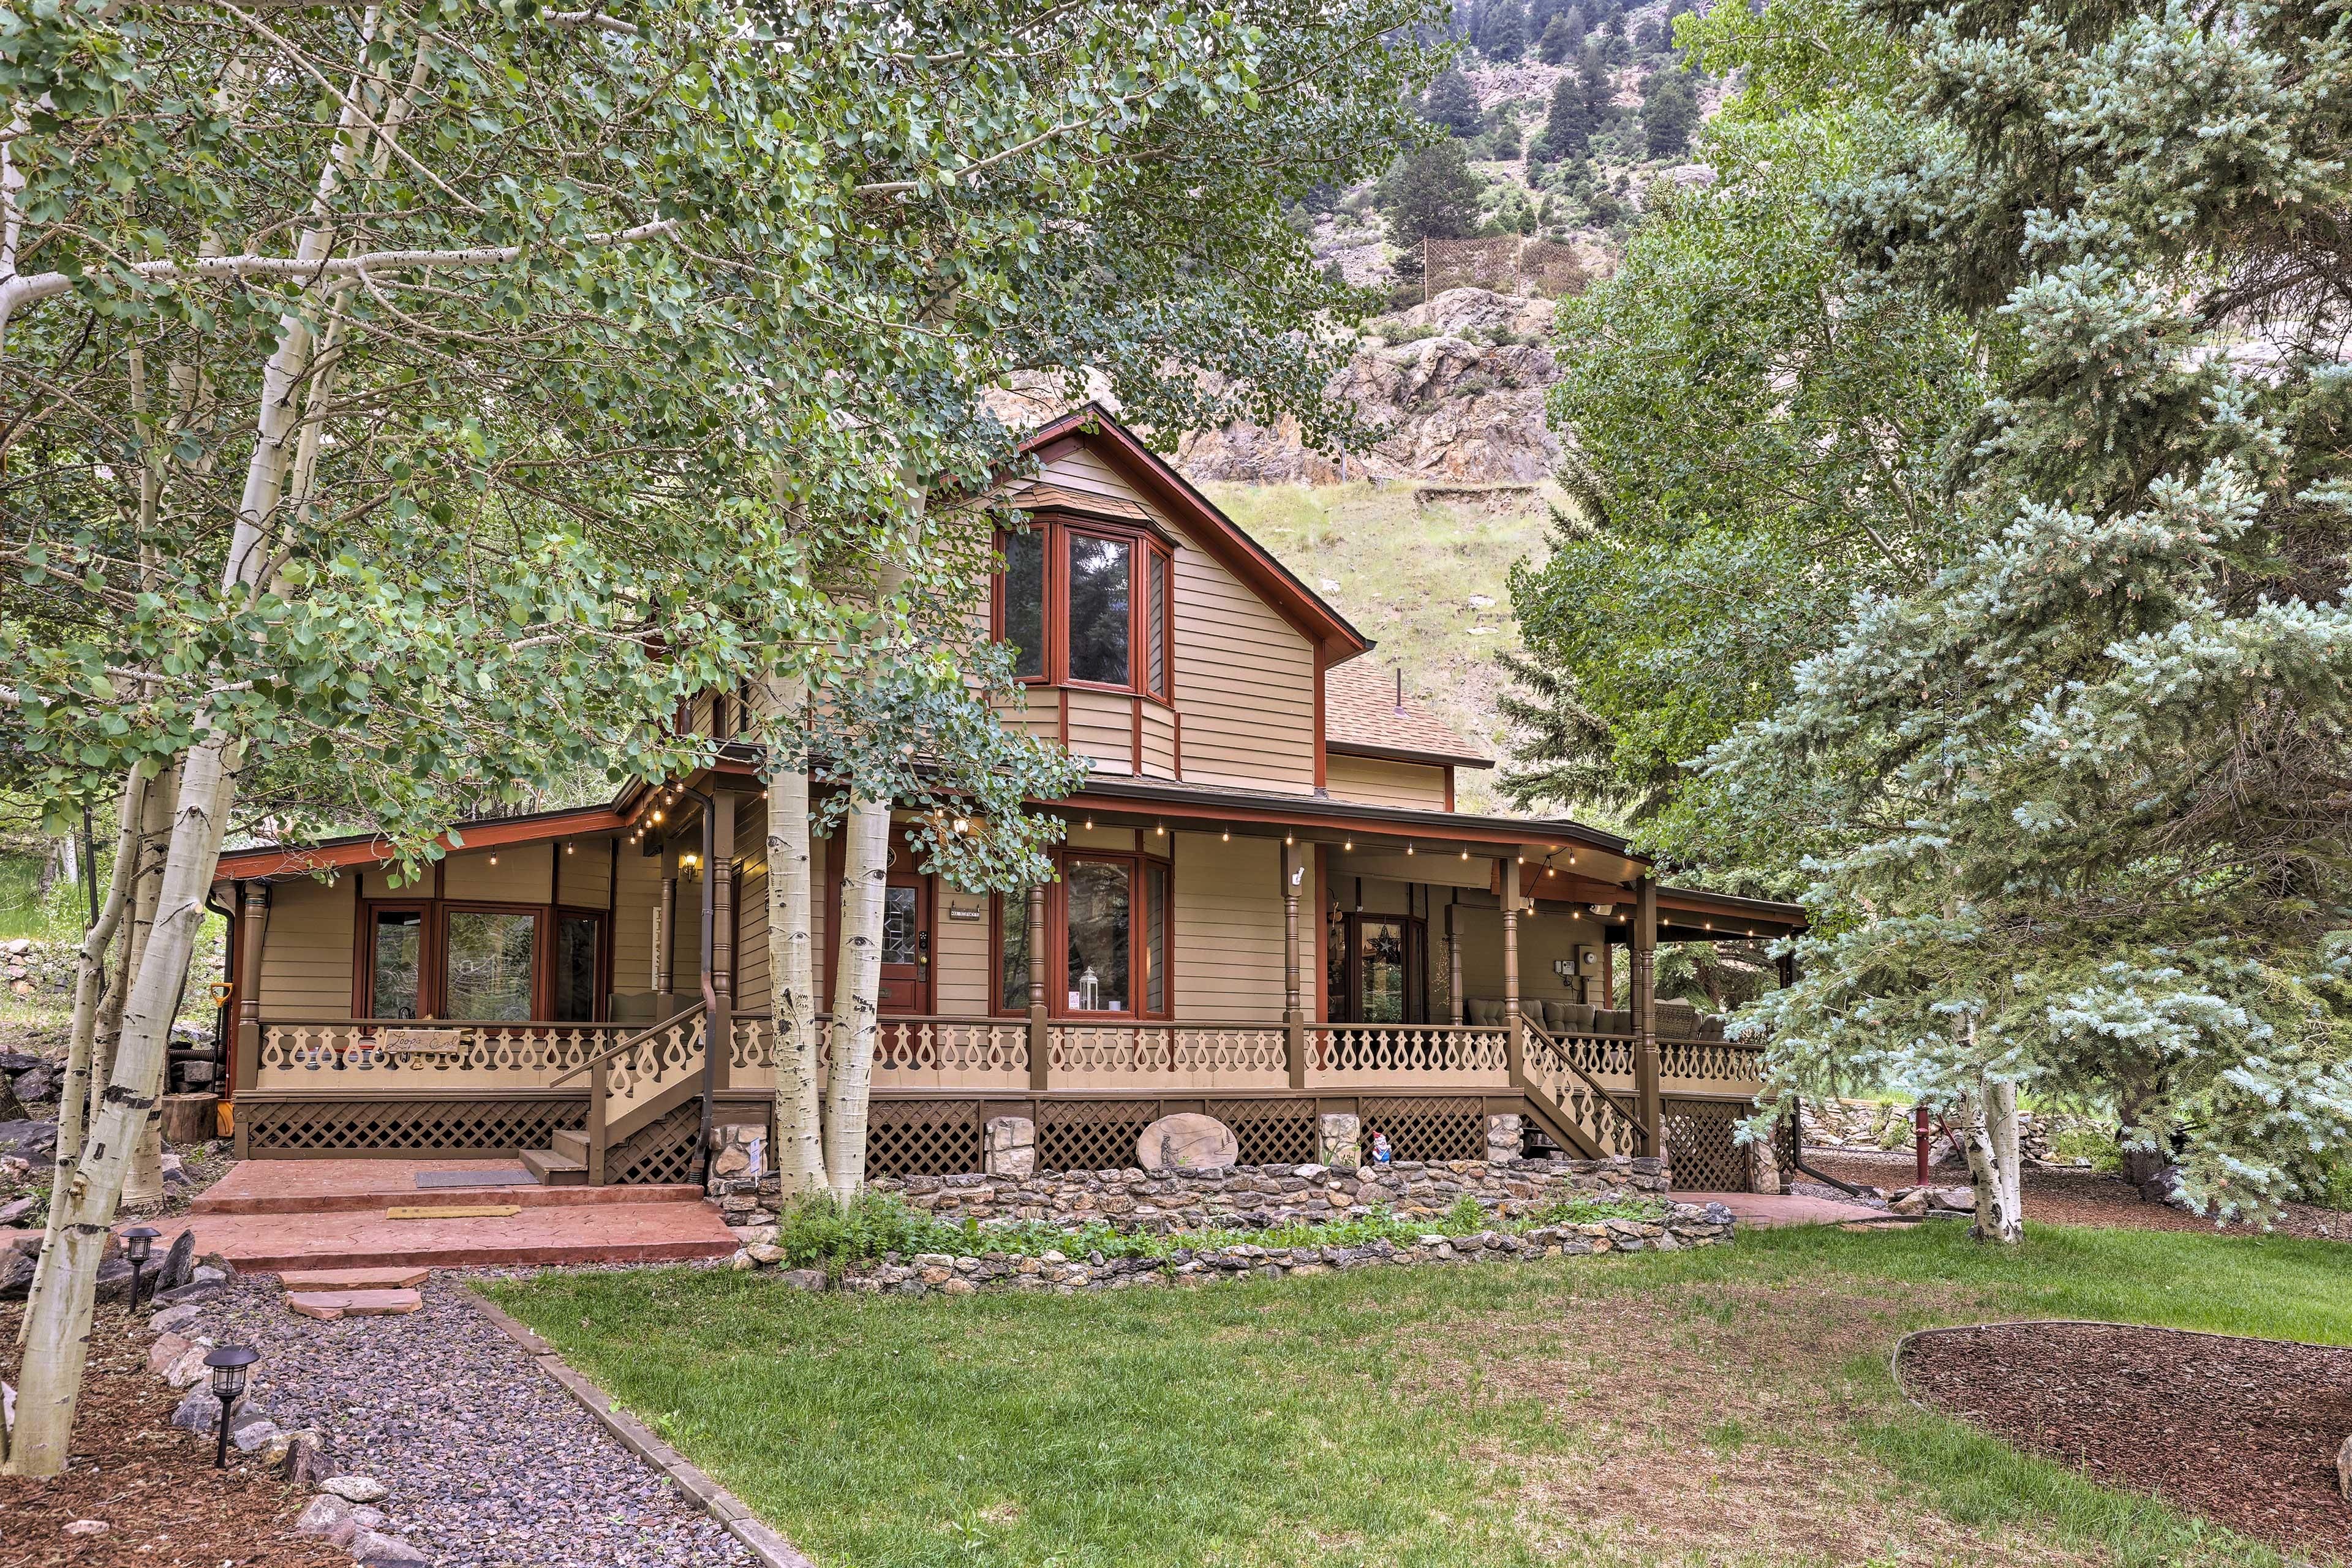 Georgetown Vacation Rental   4BR   3BA   2,025 Sq Ft   2 Stories